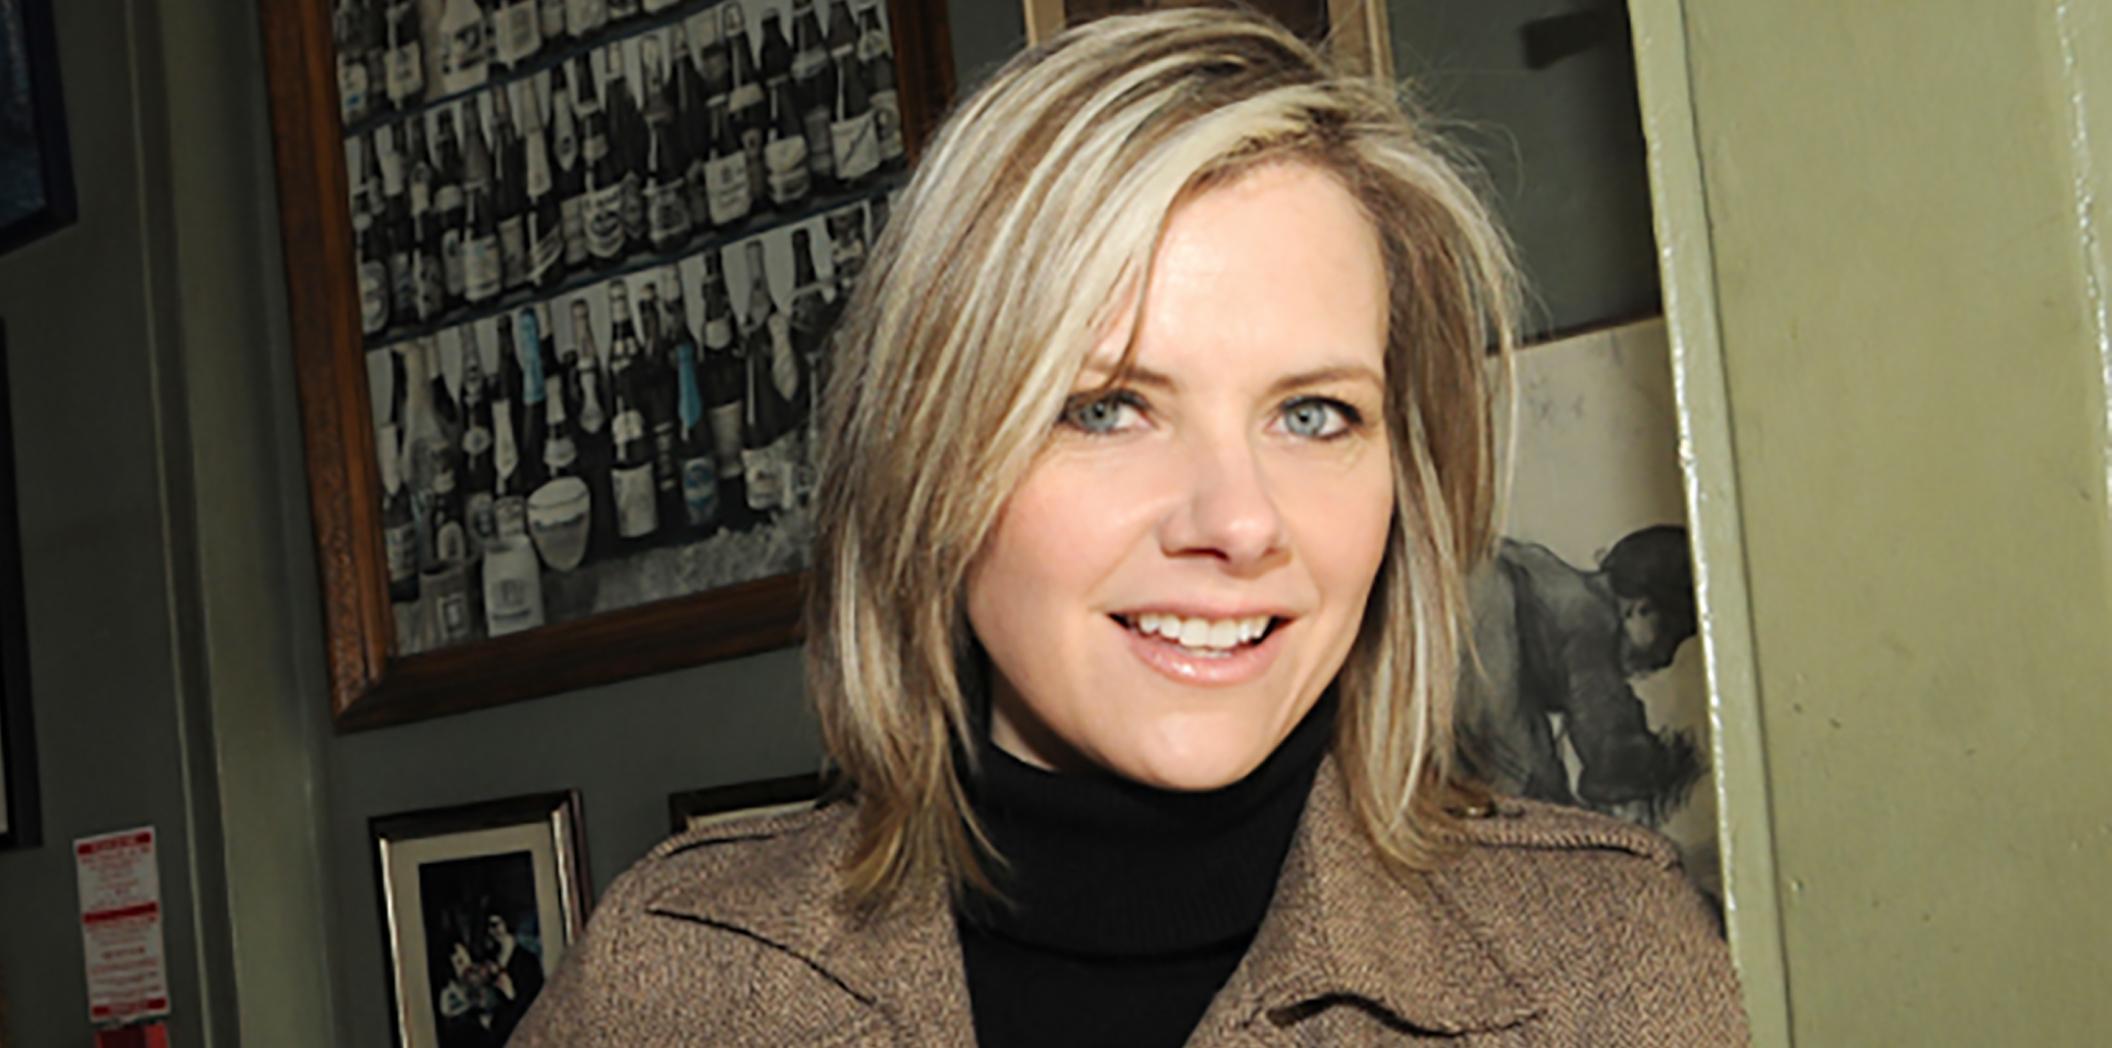 Melanie Doane, Founder & Executive Director, Doane Uschool